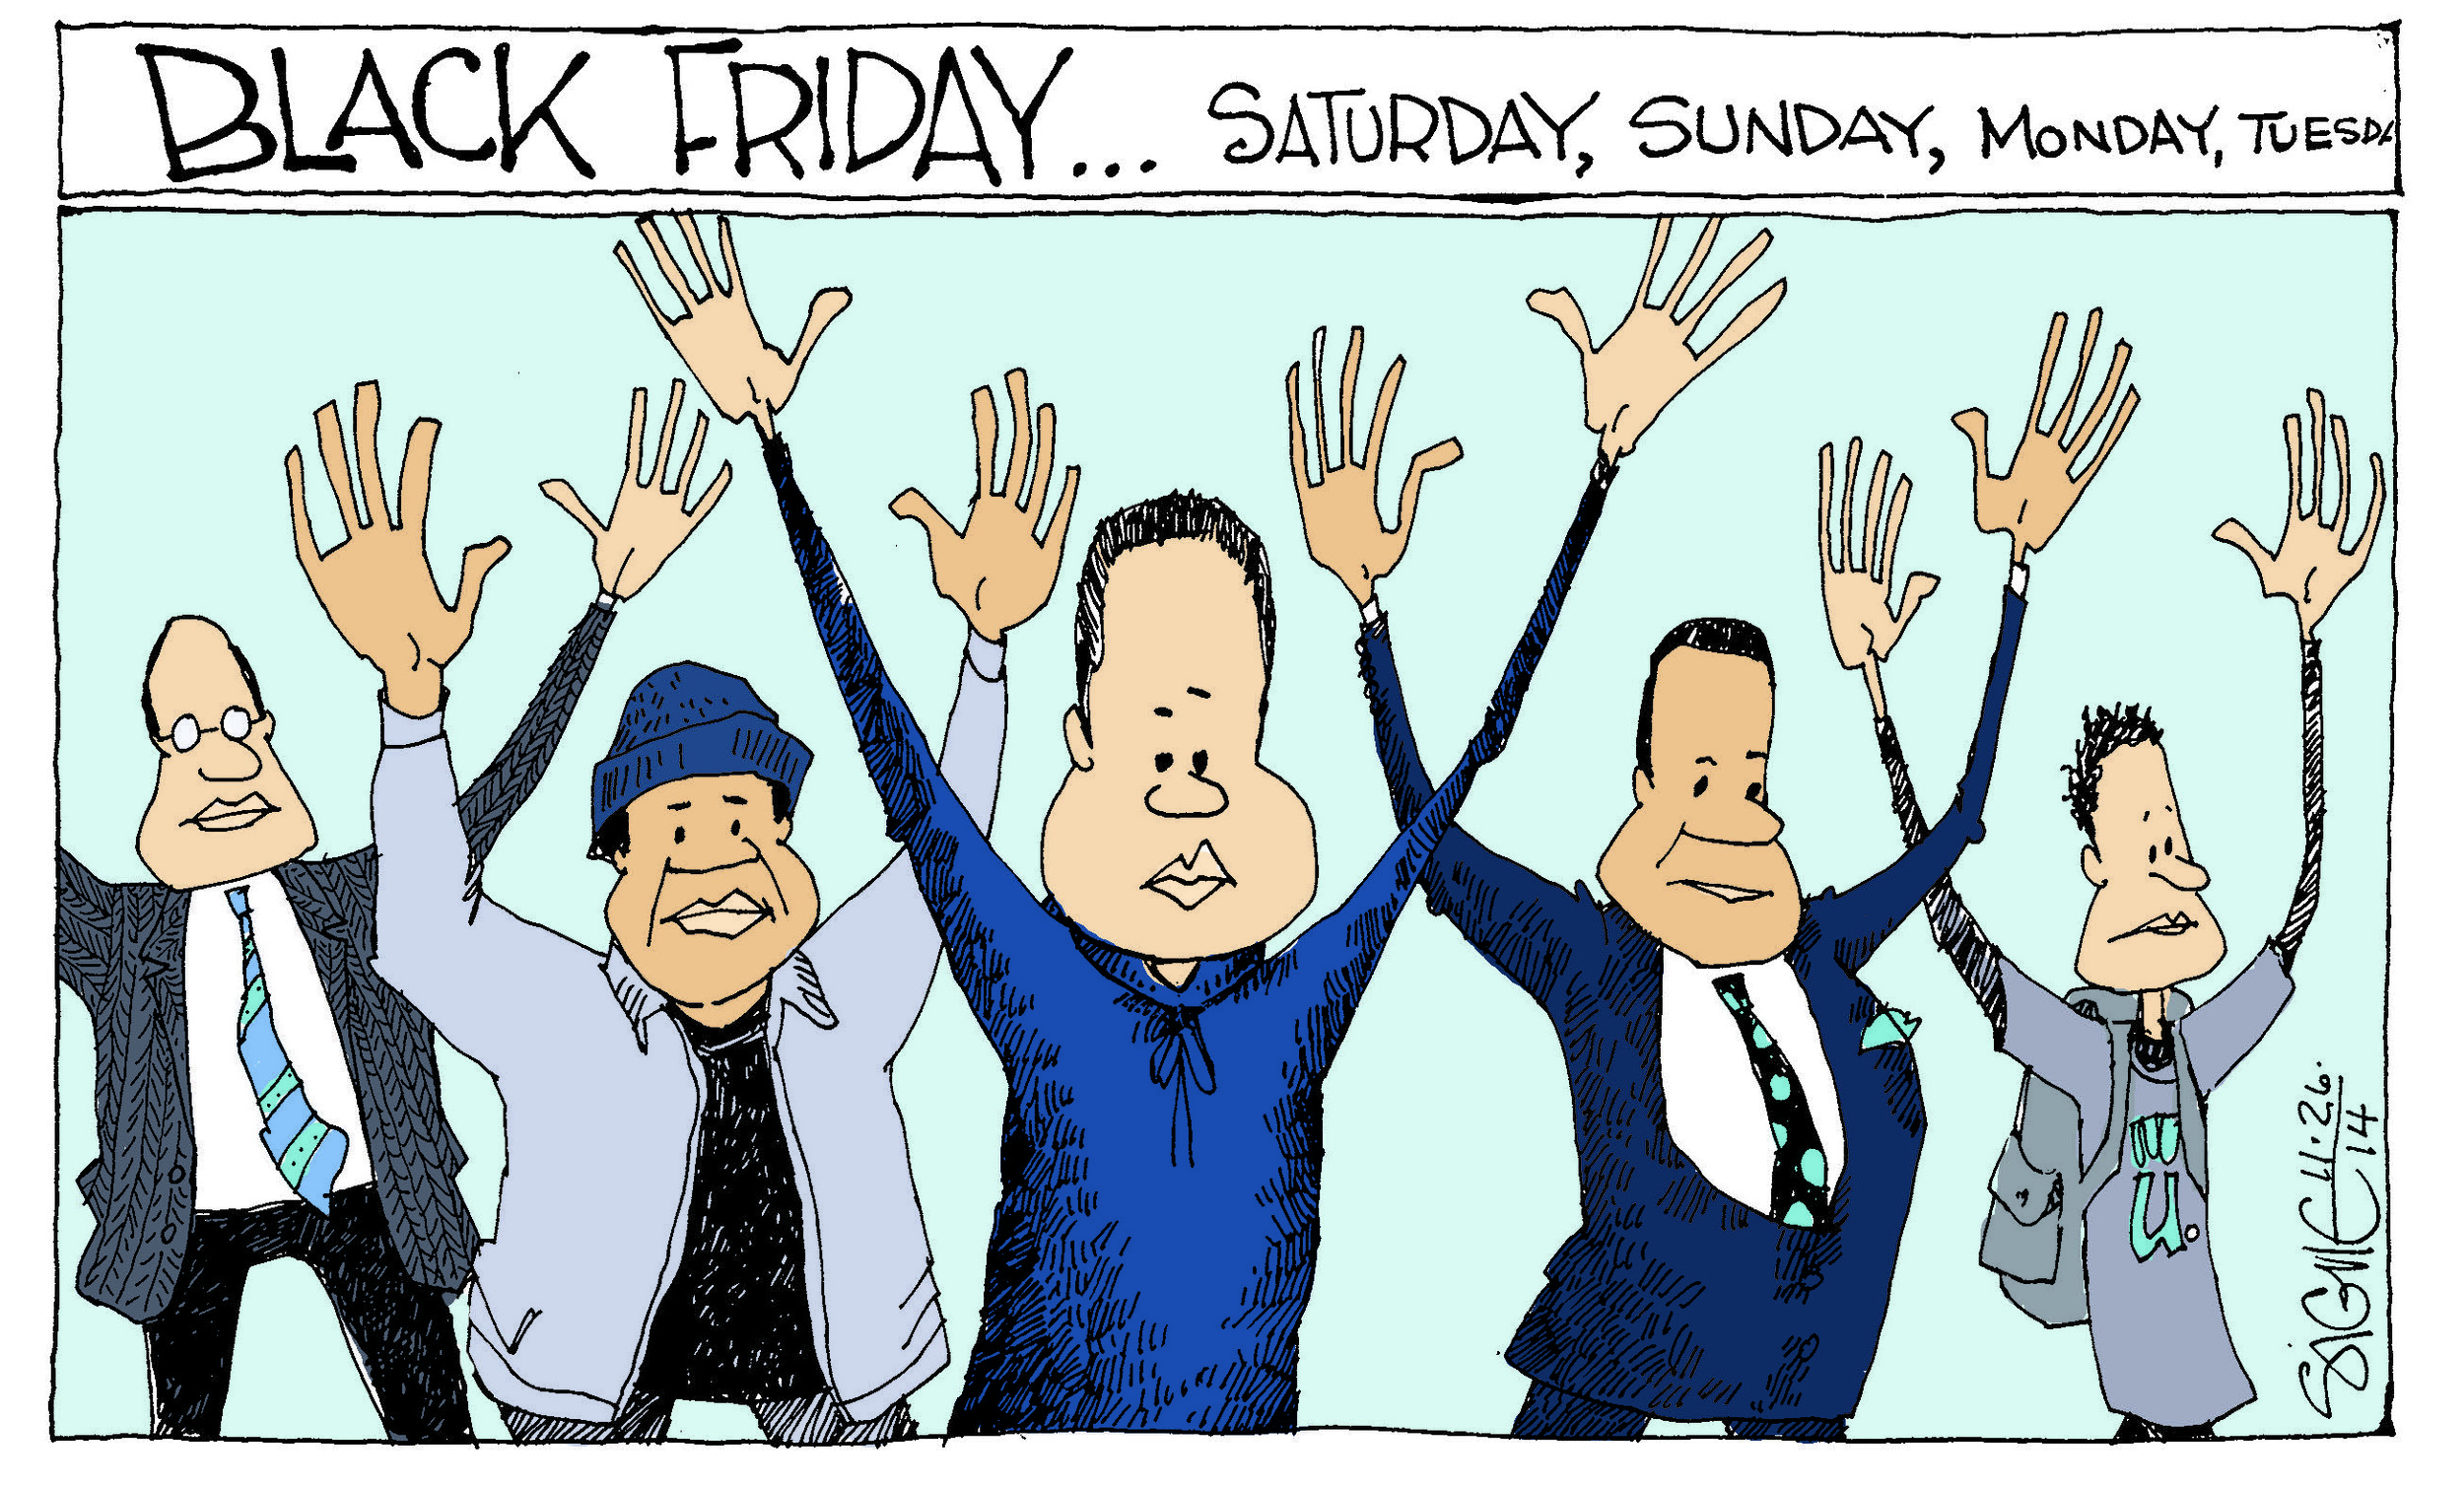 11-26-14 Black FridayC.jpg